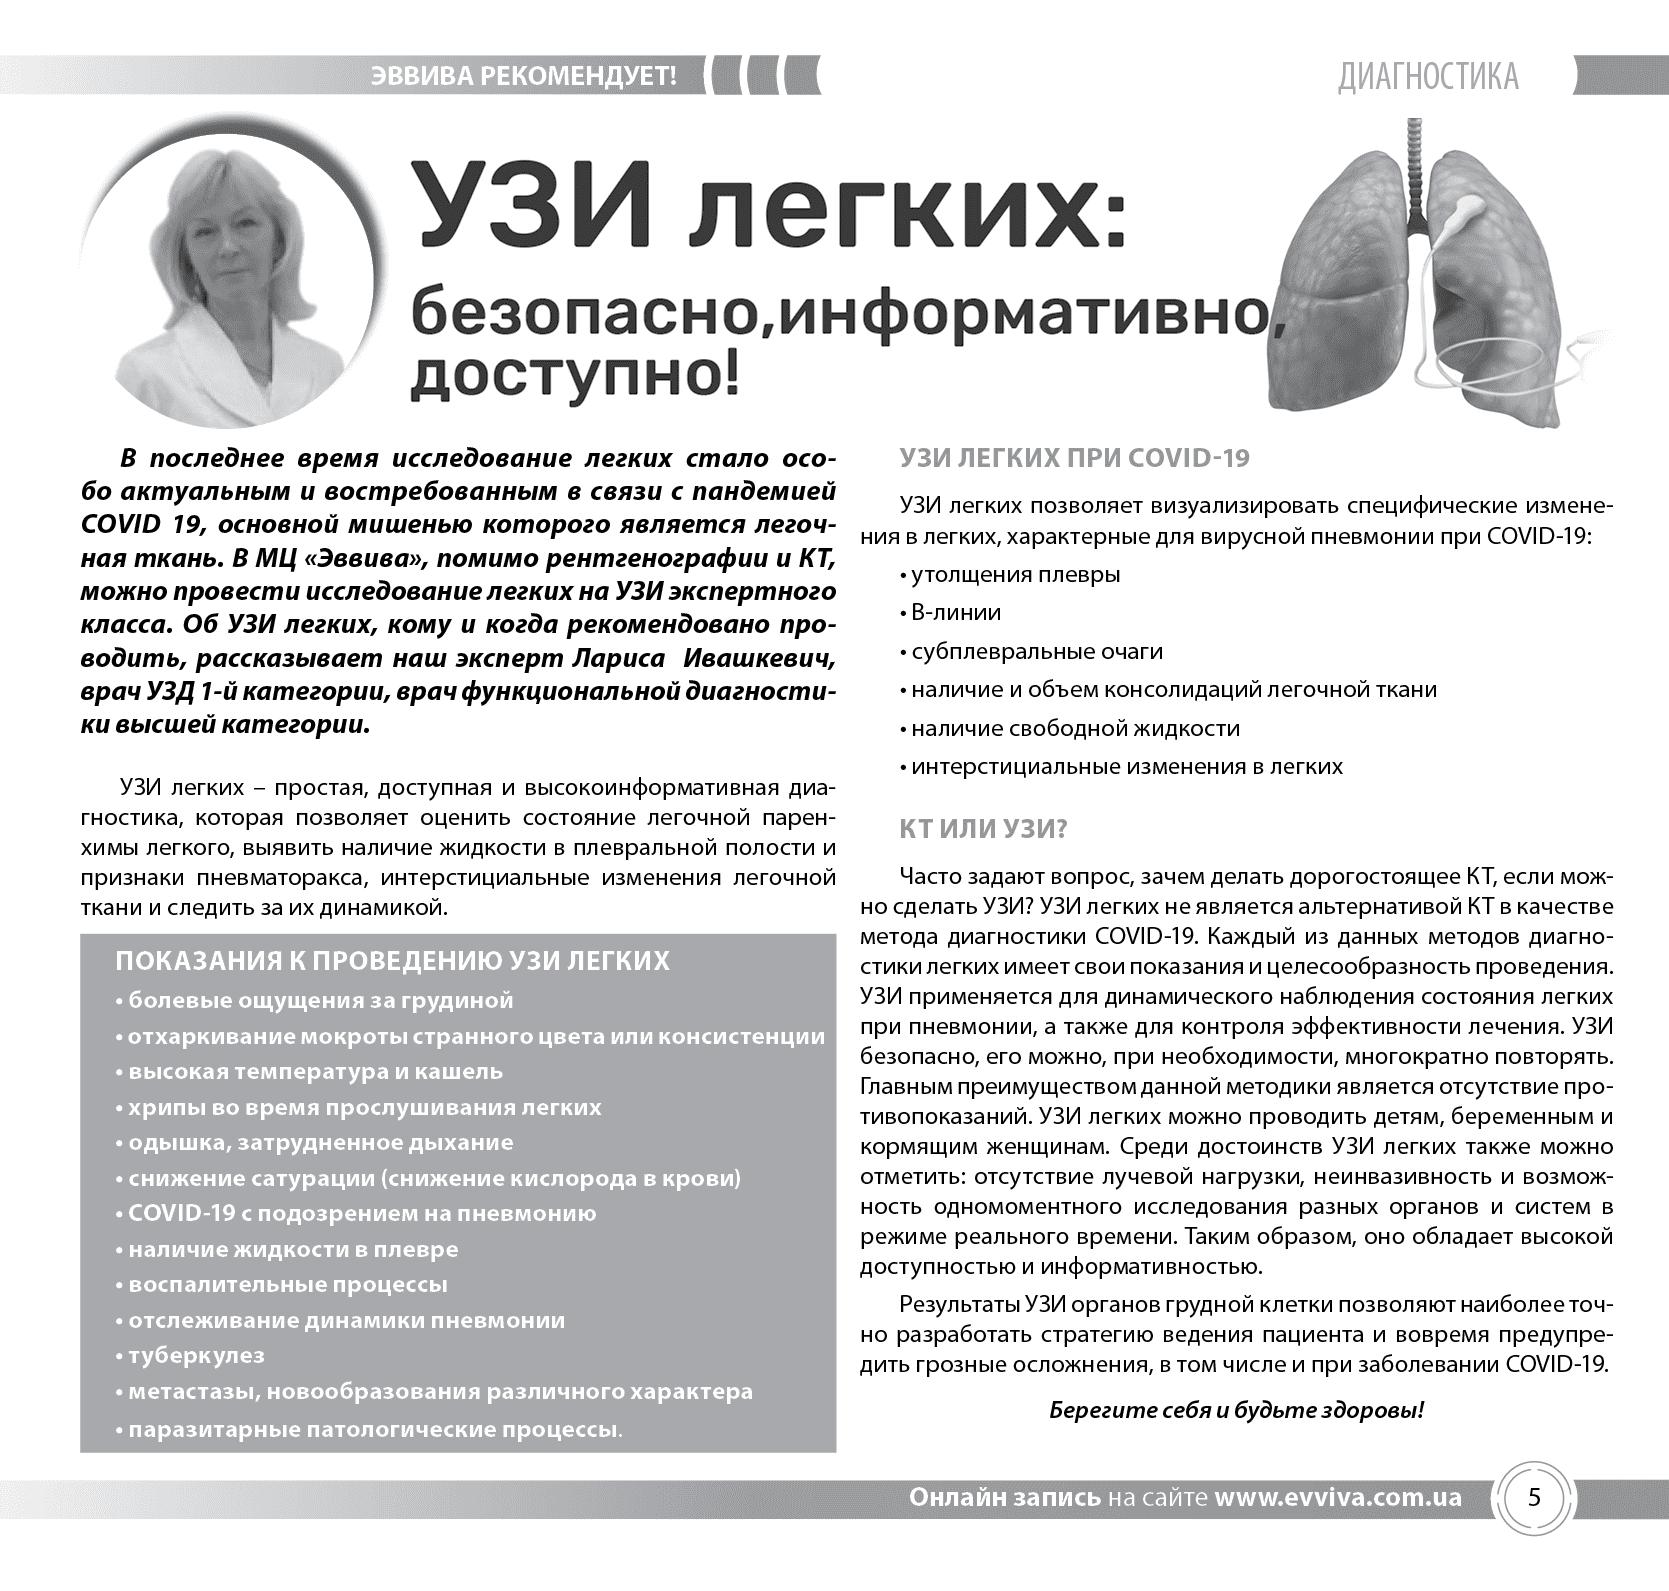 evviva-zhurnal-118-page5